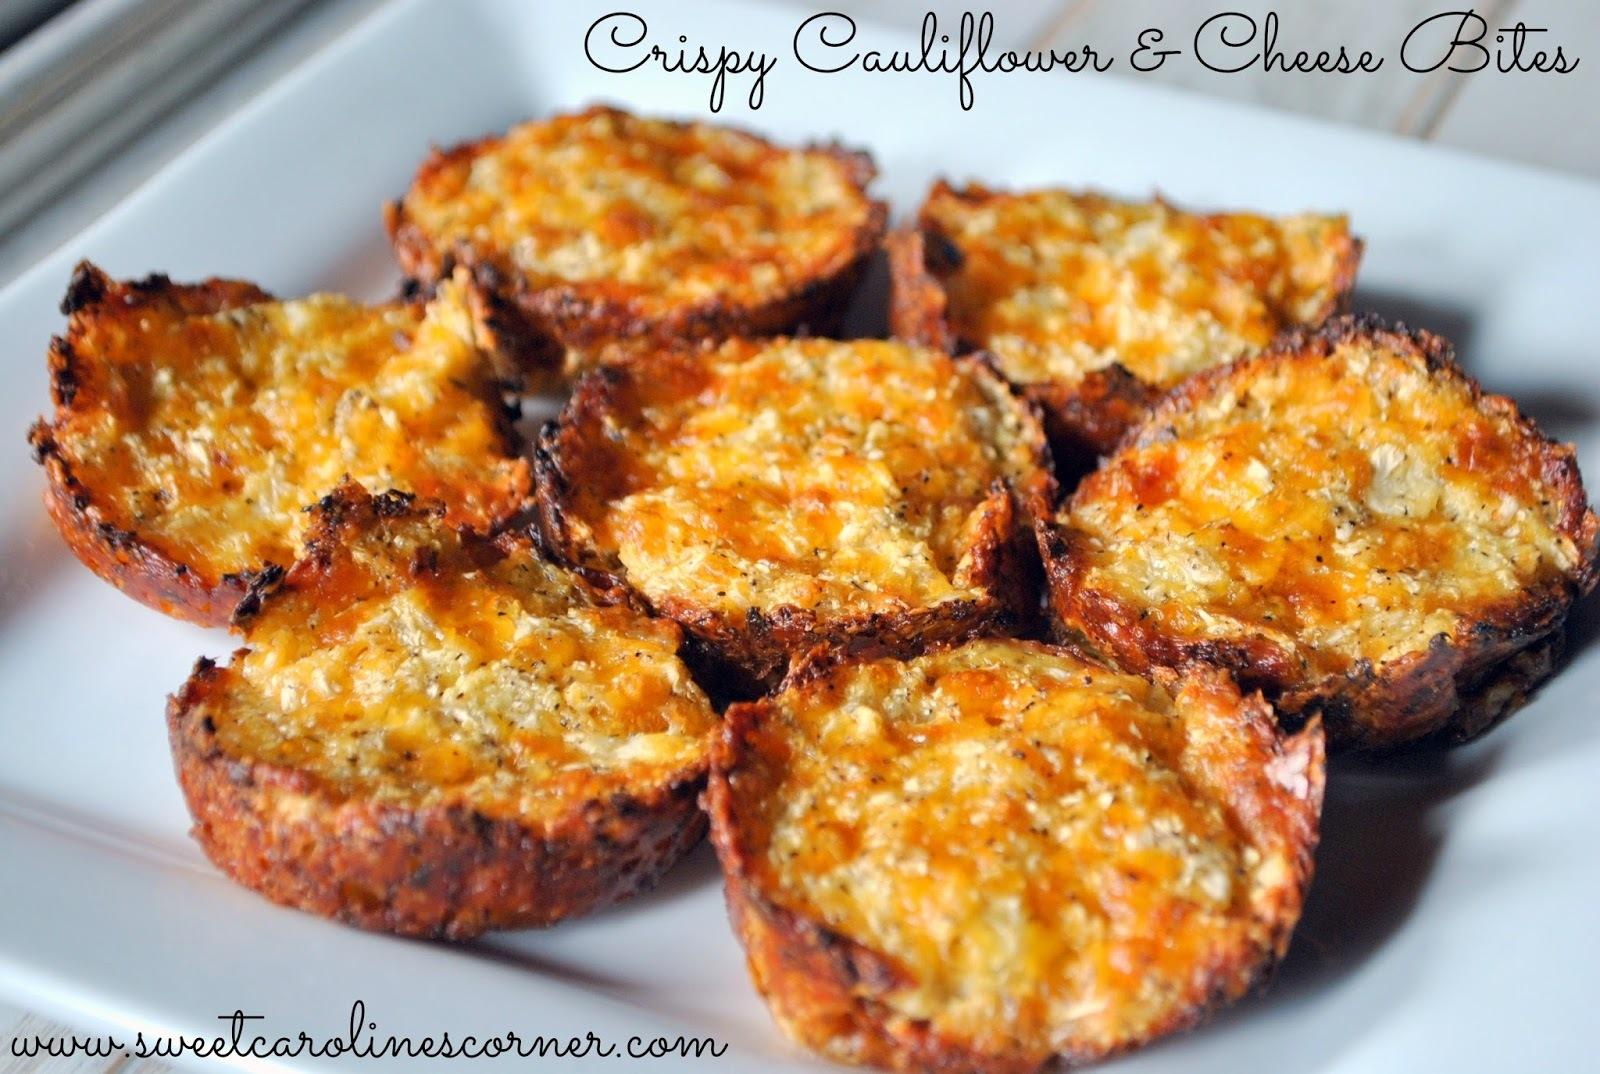 Crispy Cauliflower & Cheese Bites/Aperitivo Crocante de Couve-flor & Queijo